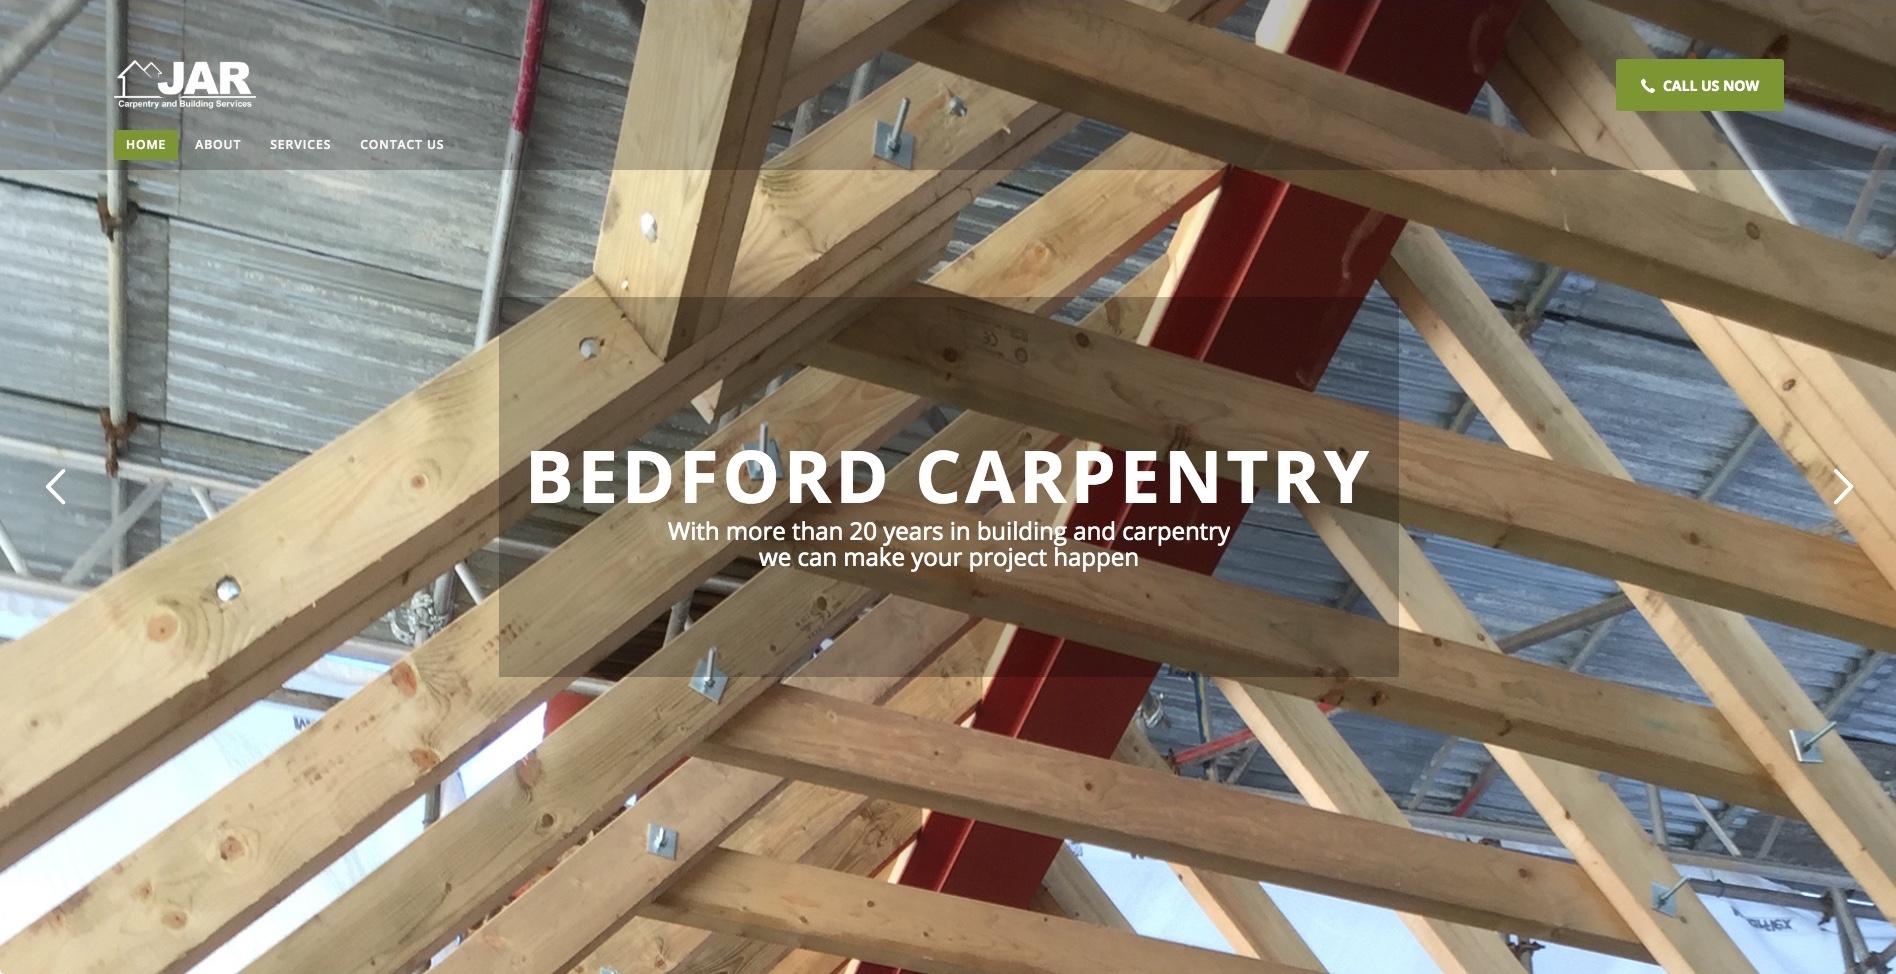 JAR Carpentry - Bedford